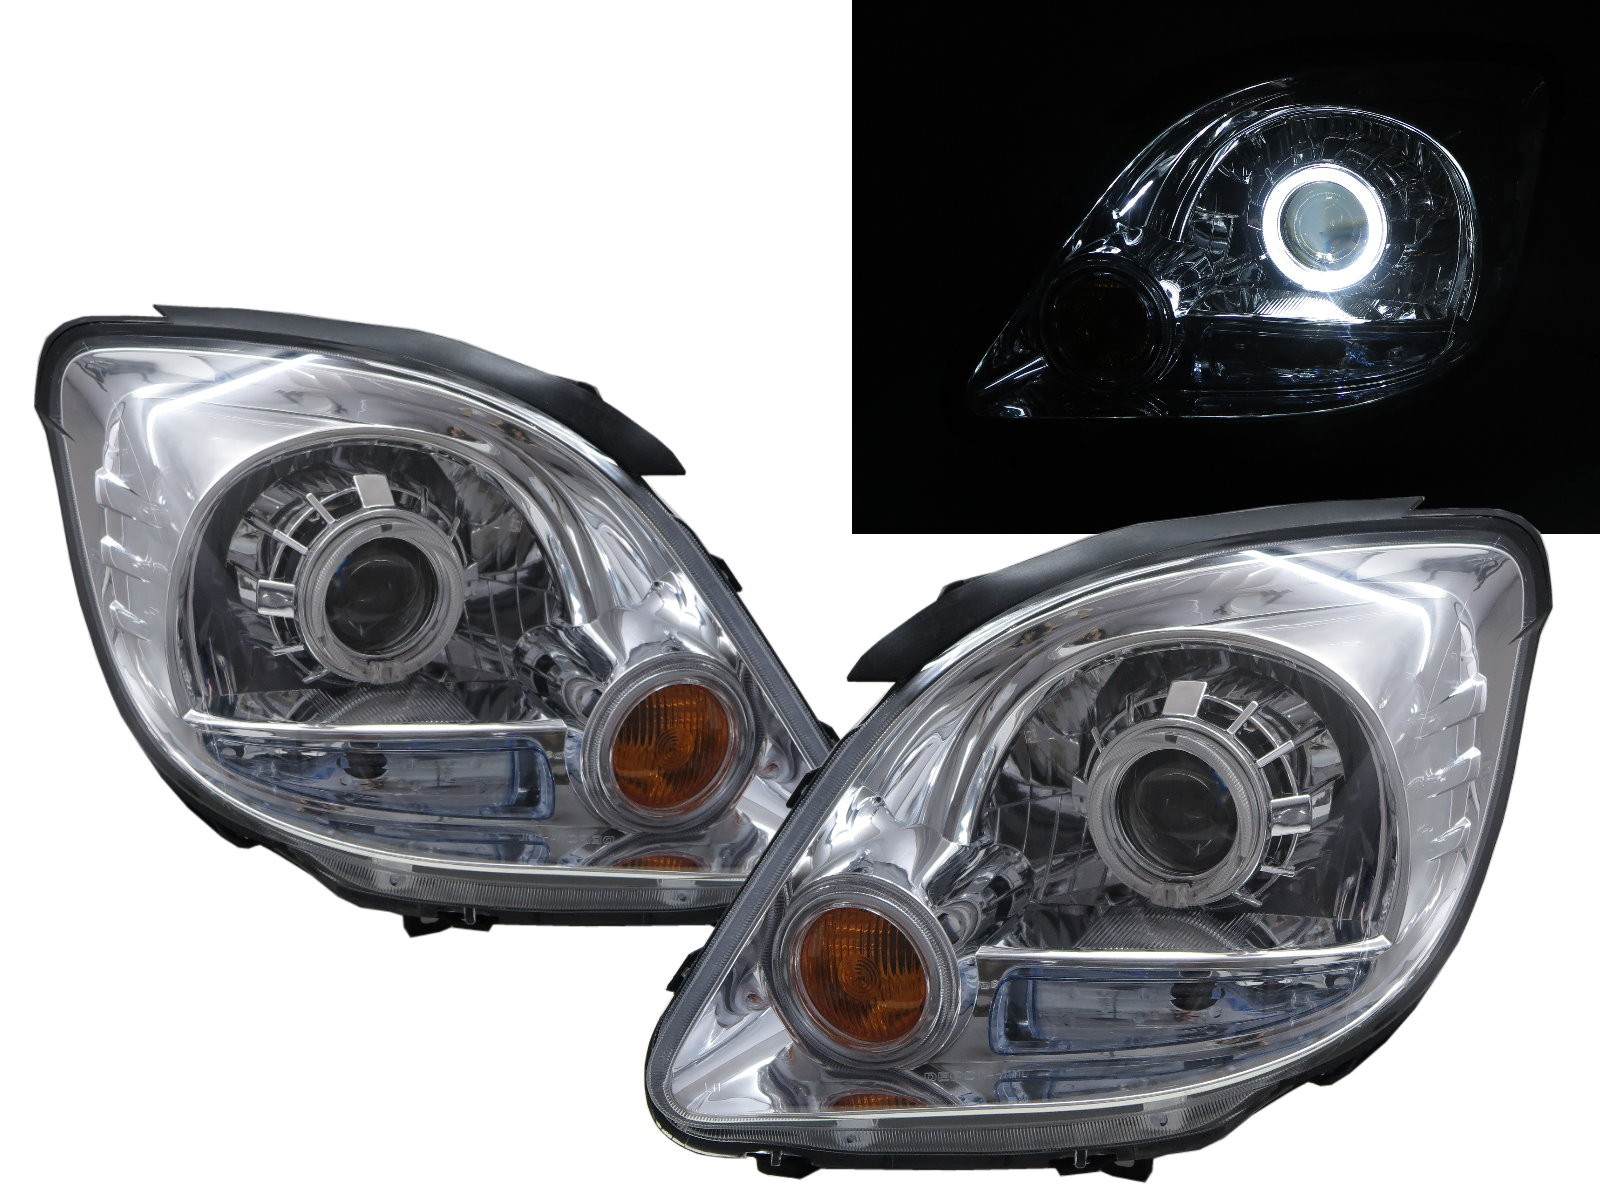 CrazyTheGod Freeca 2004-2008 Wagon/Truck 2D/5D Guide LED Angel-Eye Projector Headlight Headlamp Chrome for Mitsubishi LHD